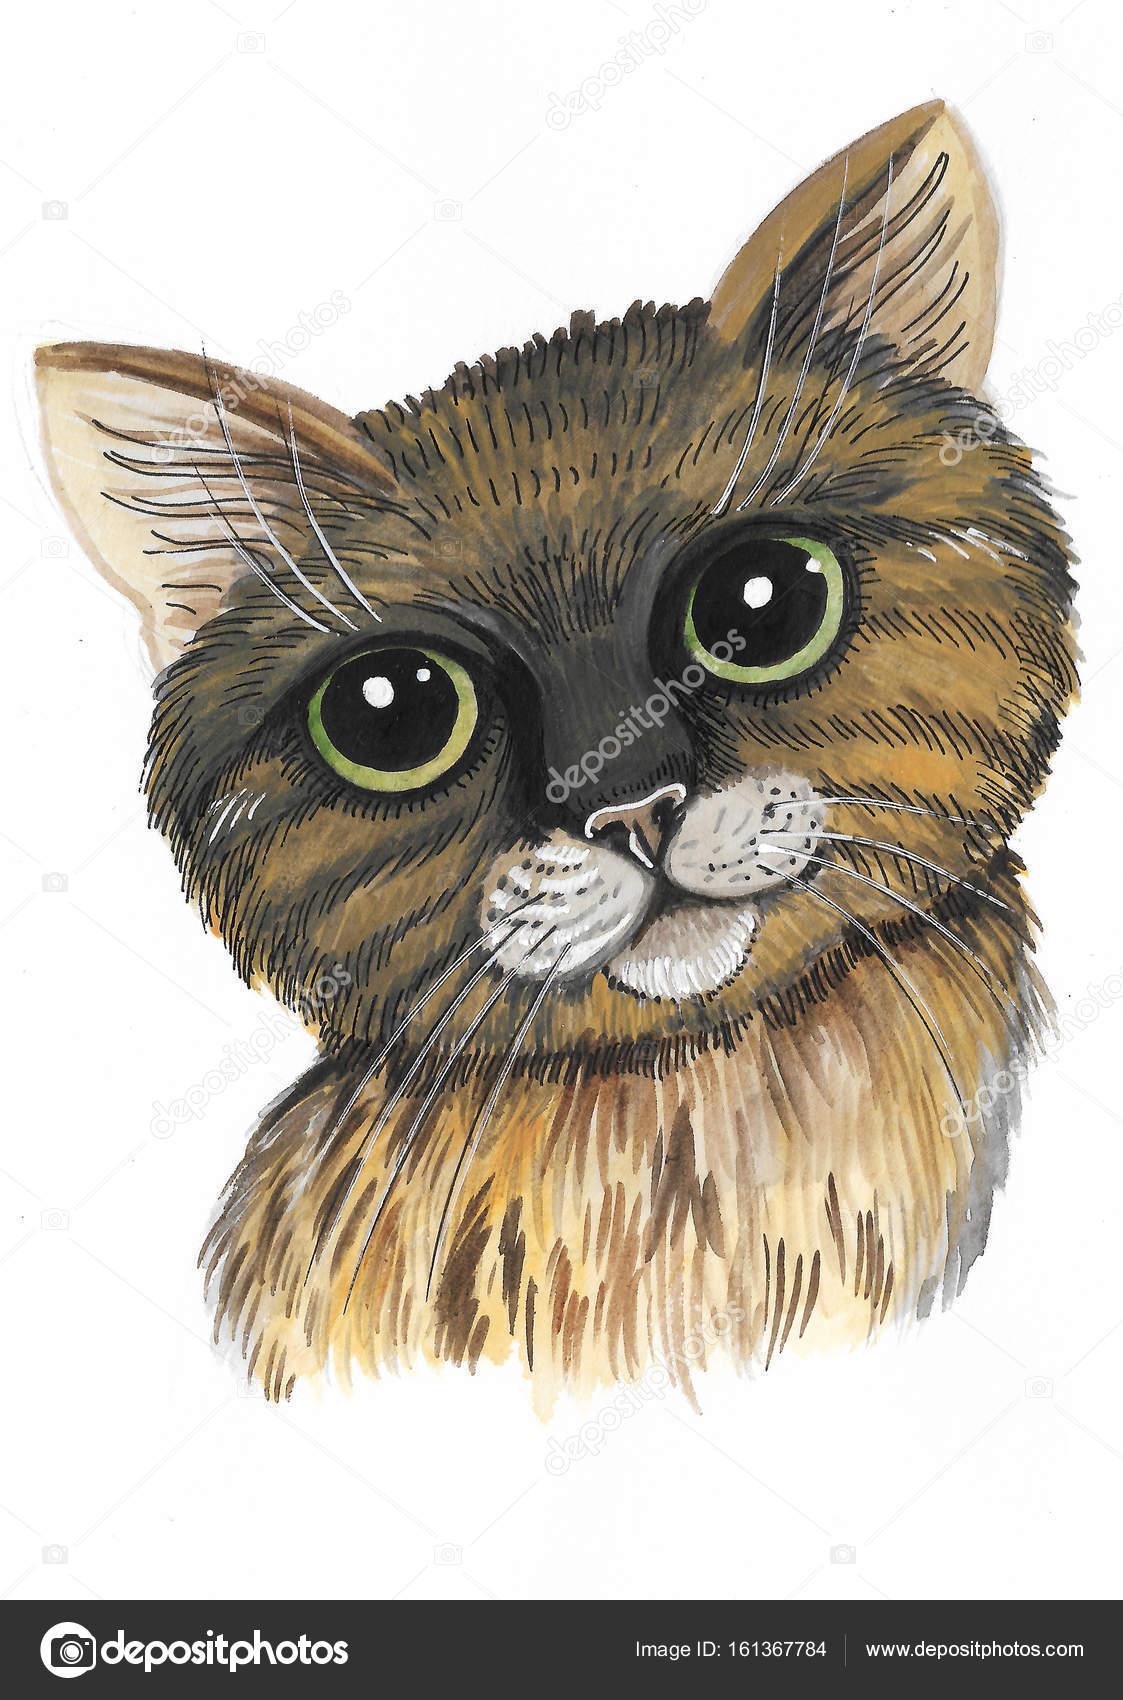 Süße Katze in Aquarell gemalt — Stockfoto © YuliaRey #161367784